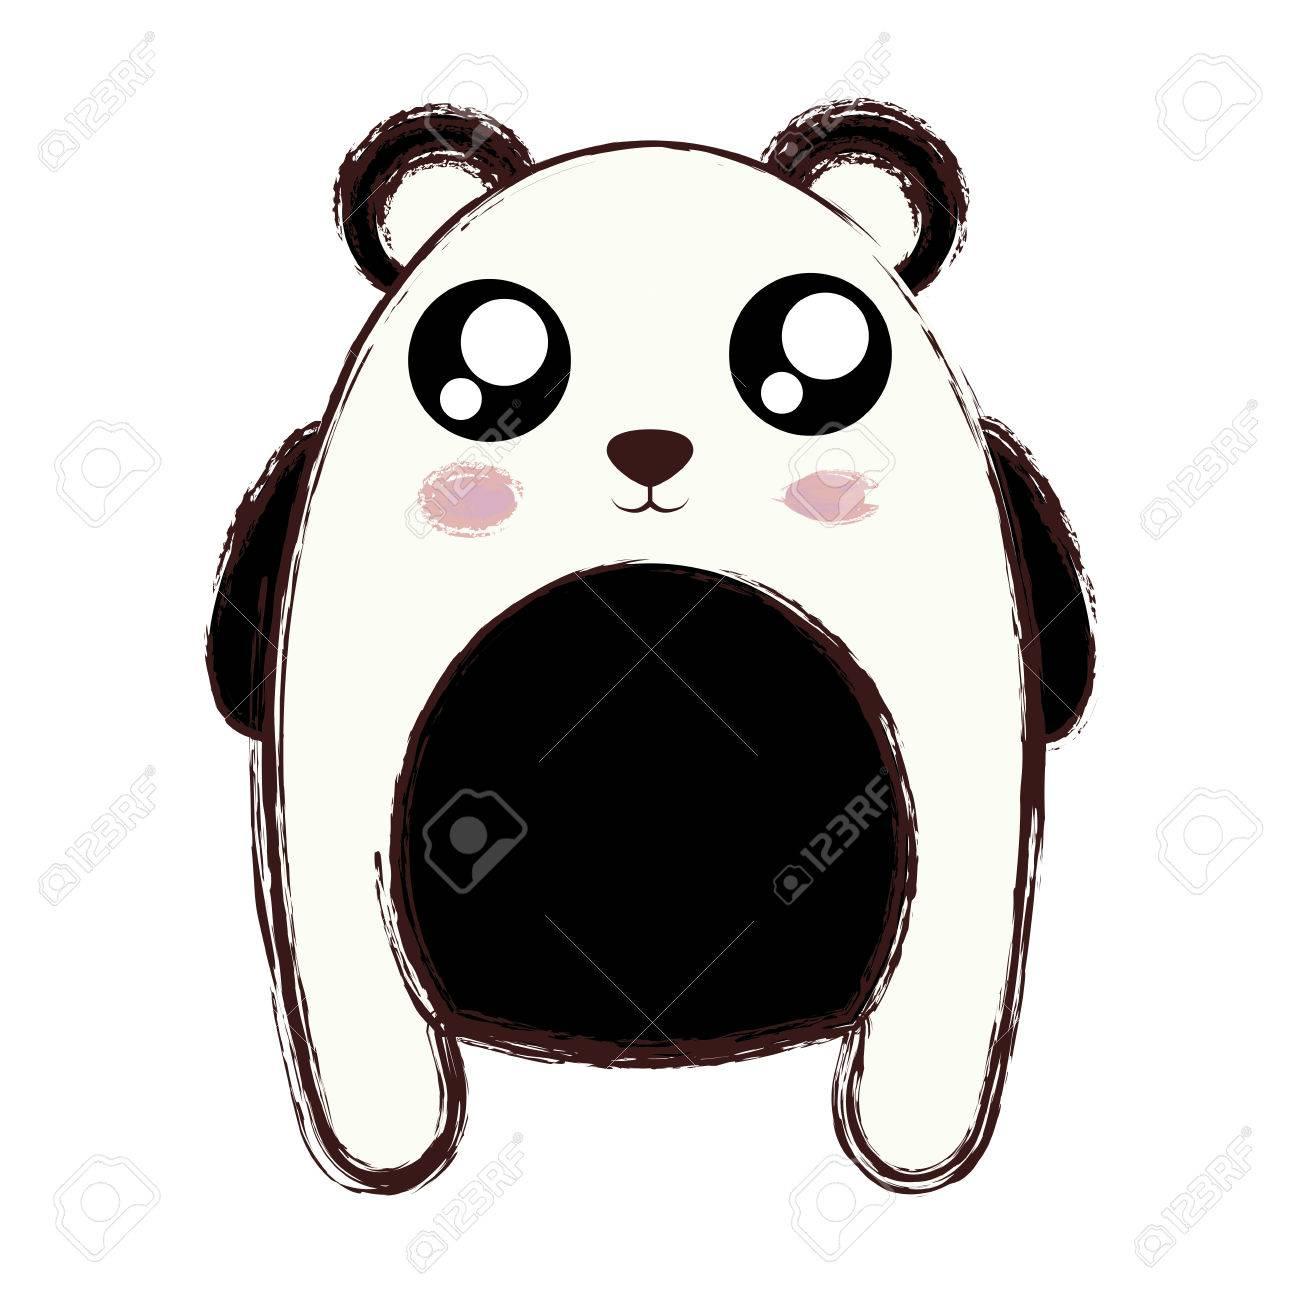 kawaii panda bear animal icon over white background colorful